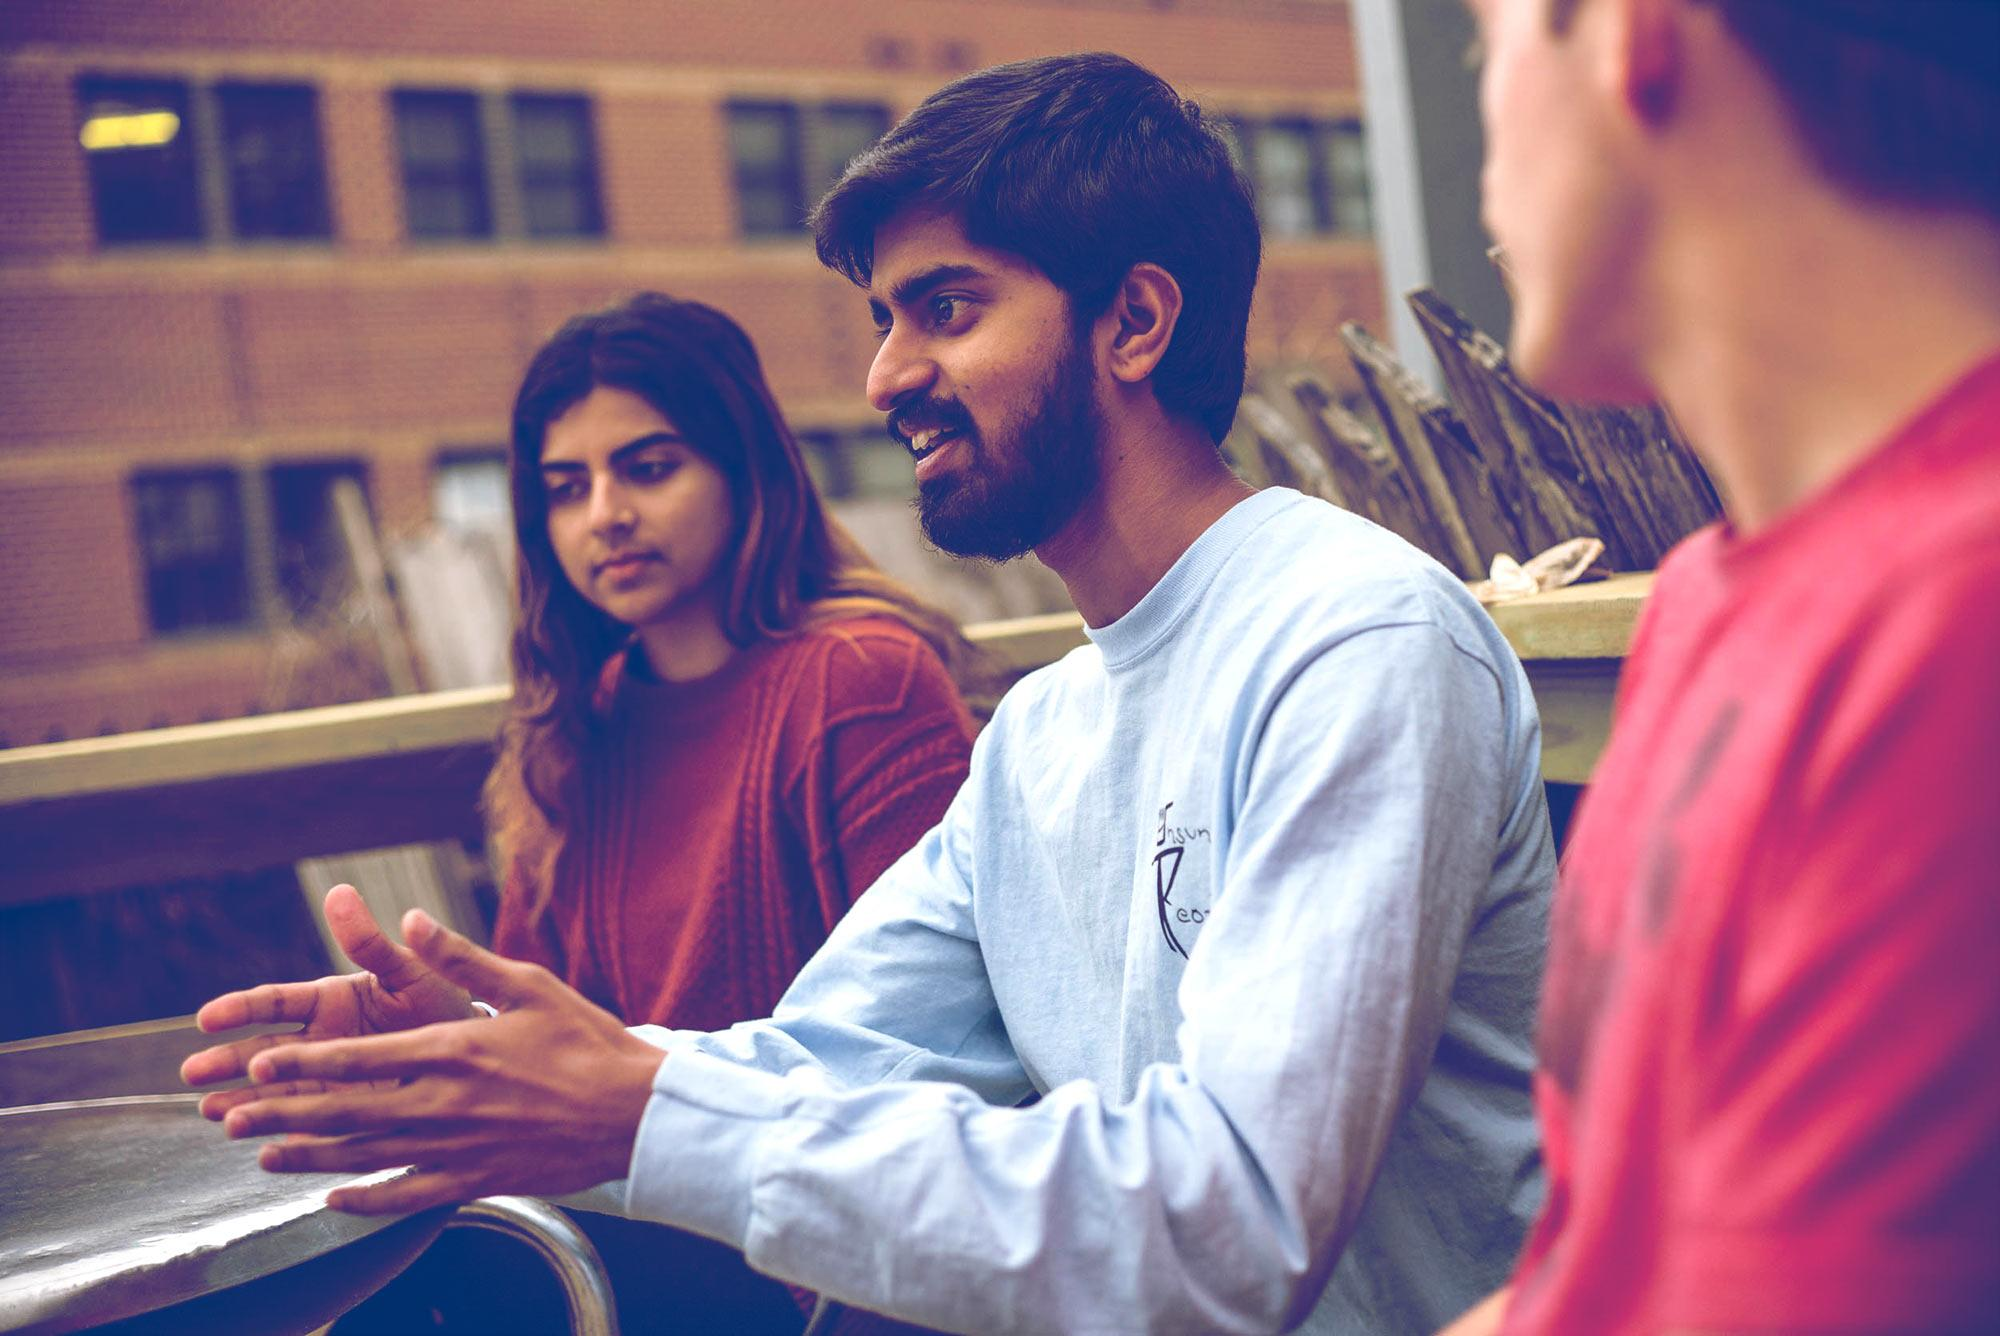 Media studies in bangalore dating